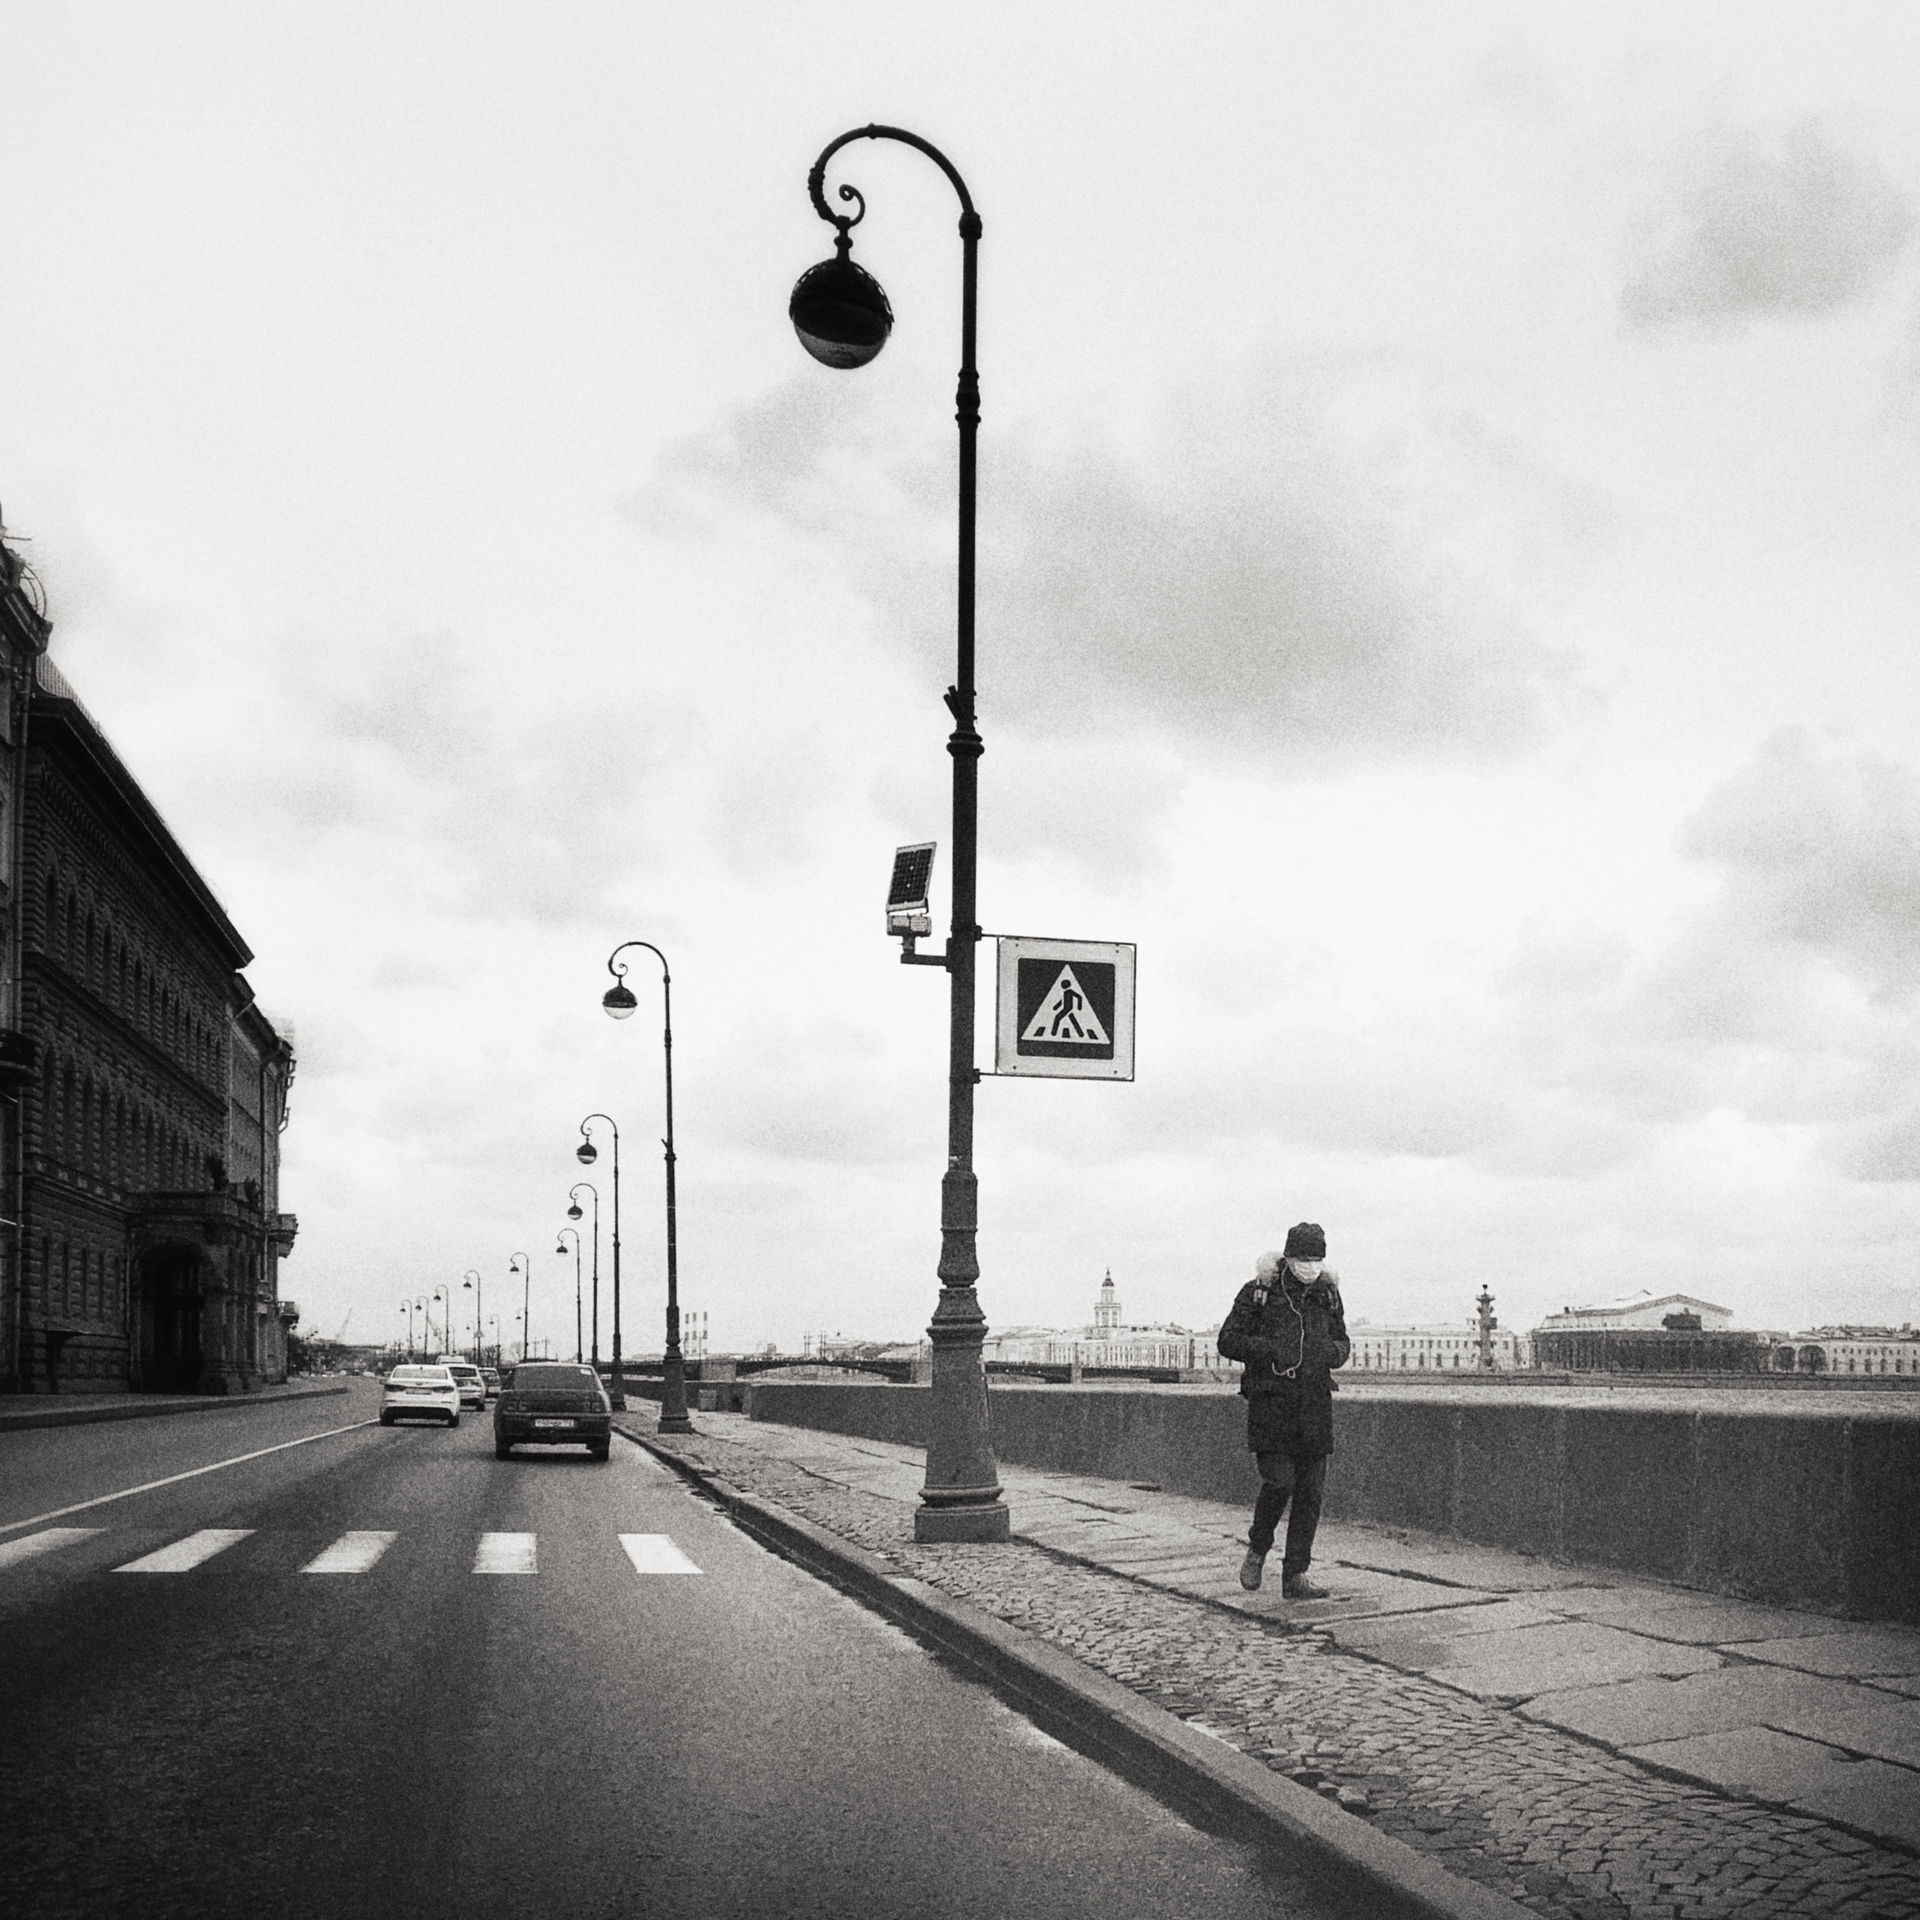 © Oleg Kolimbet